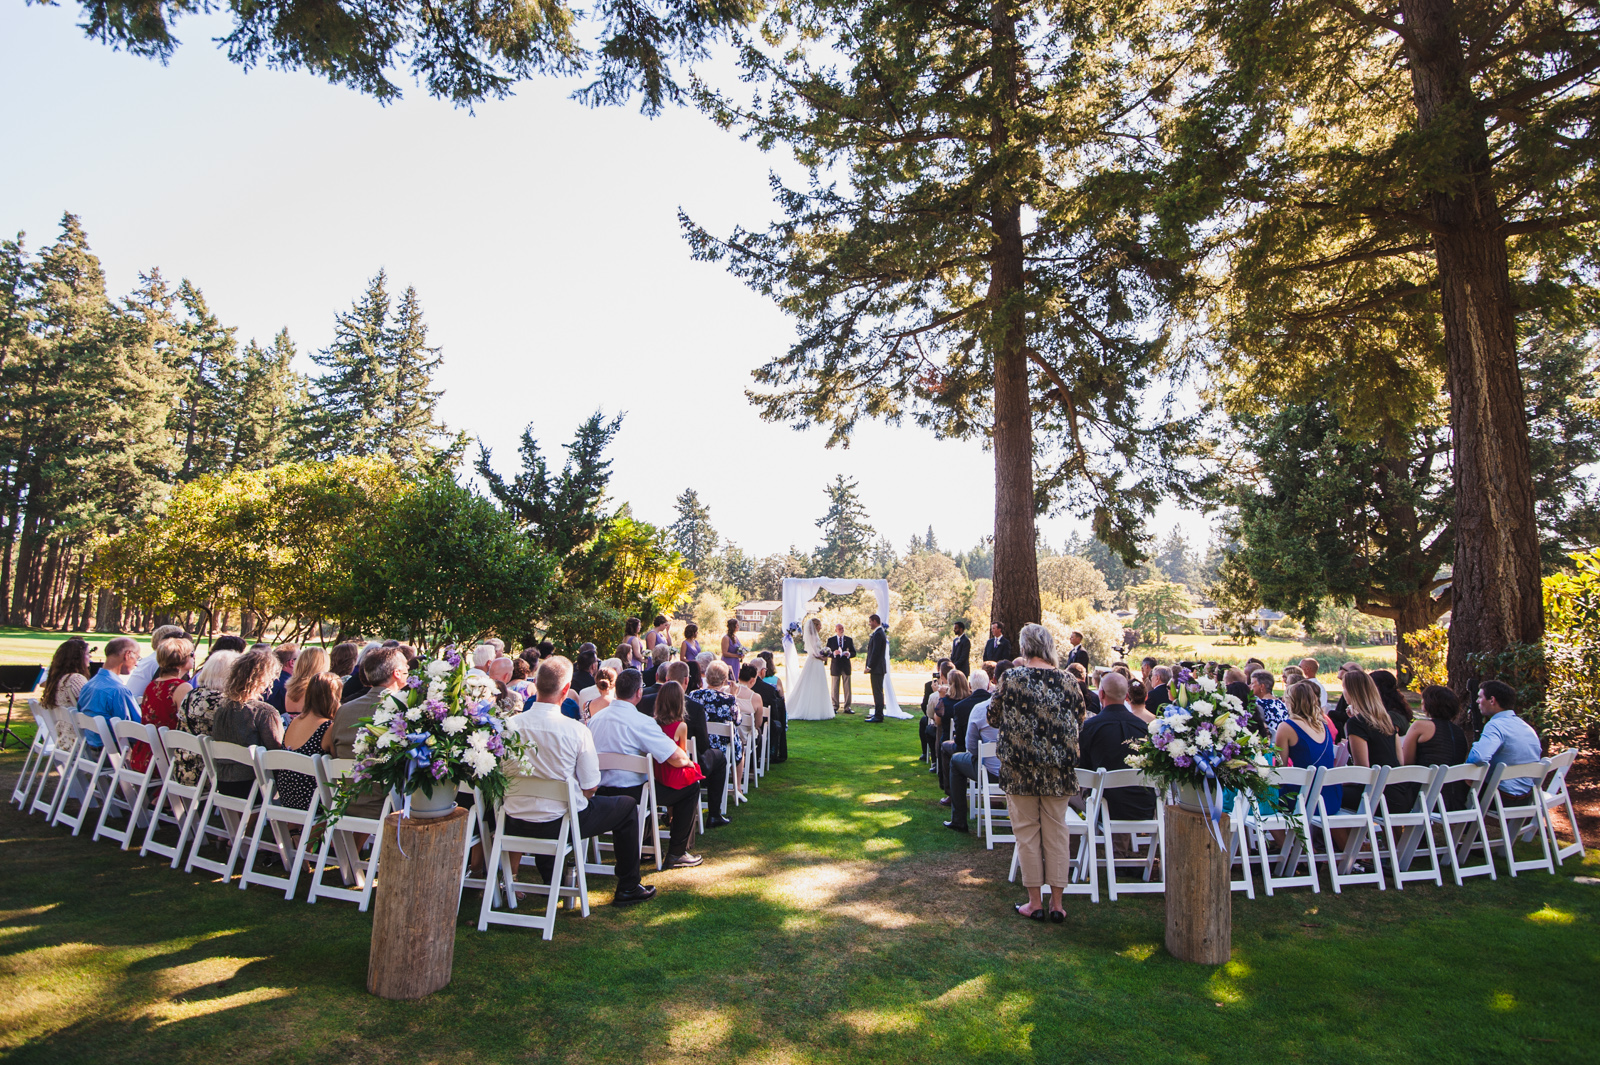 victoria-wedding-photographers-royal-colwood-golf-course-wedding-17.jpg